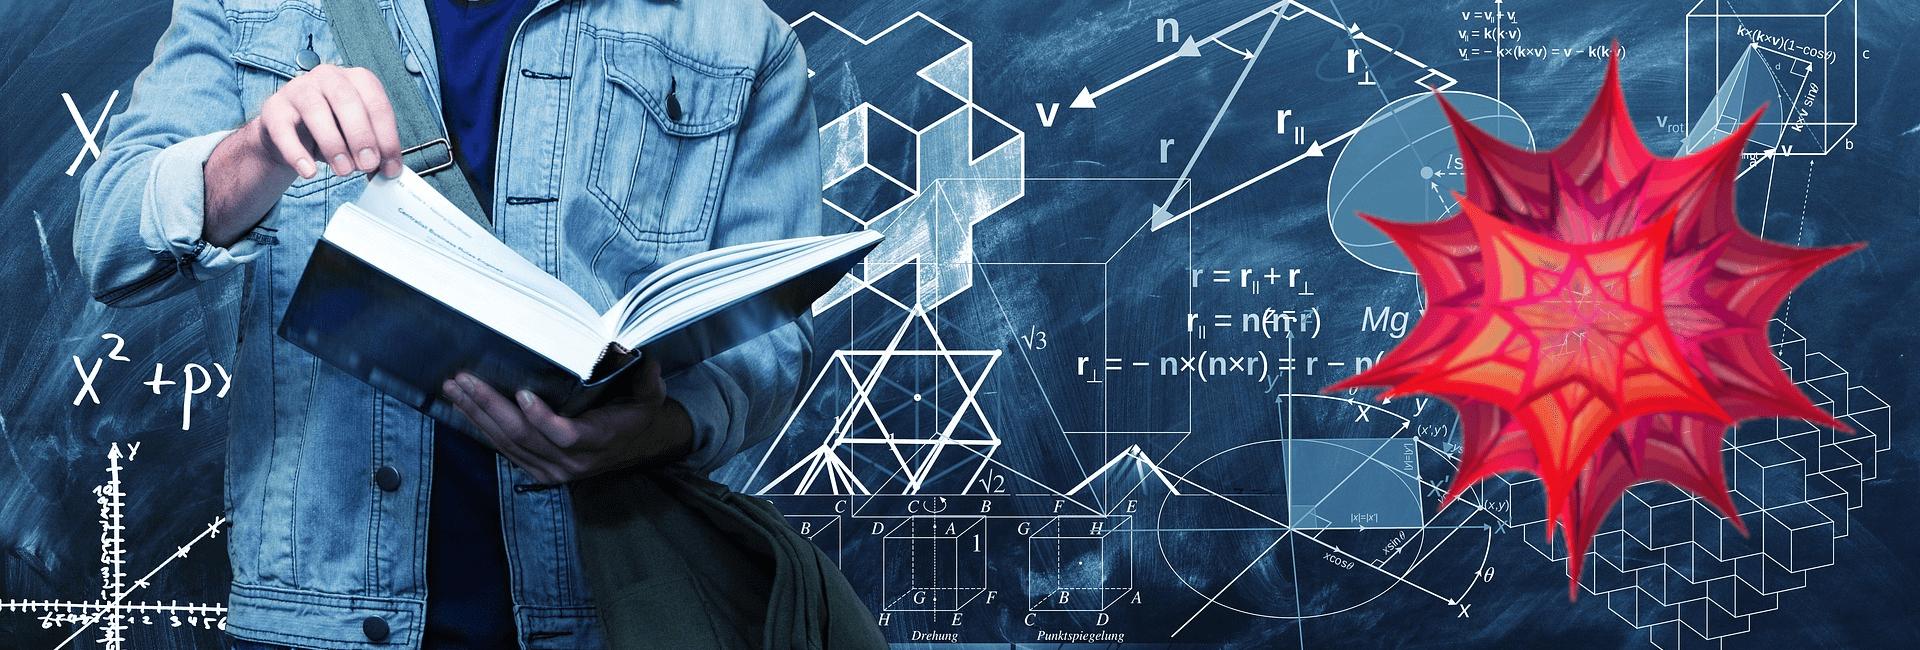 Wolfram Mathematica i System Modeler